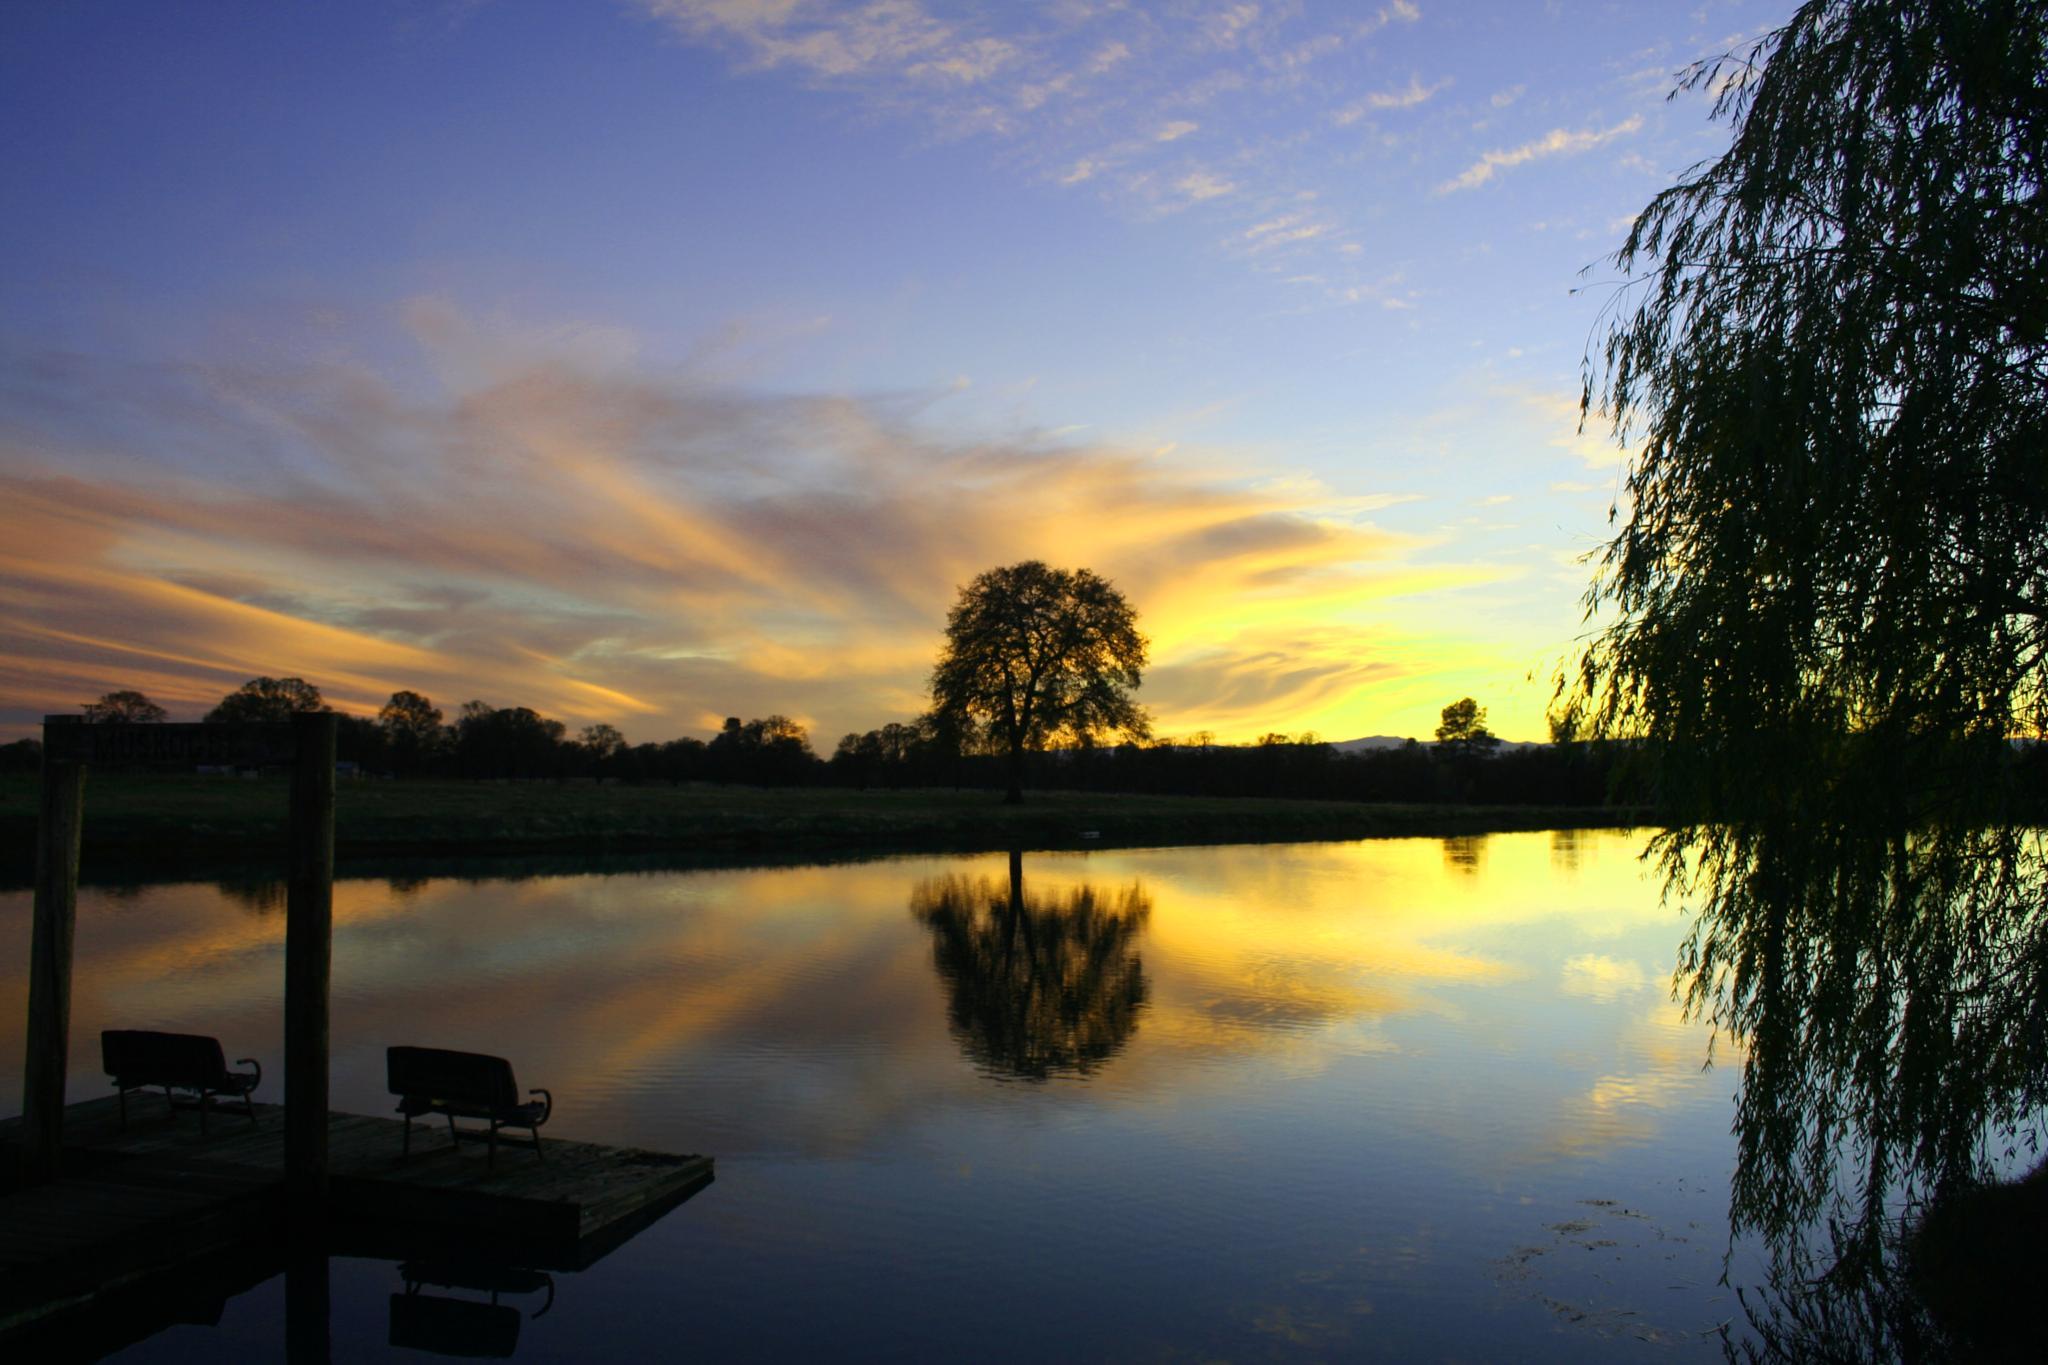 Sunset on Kens Pond by rickinredding